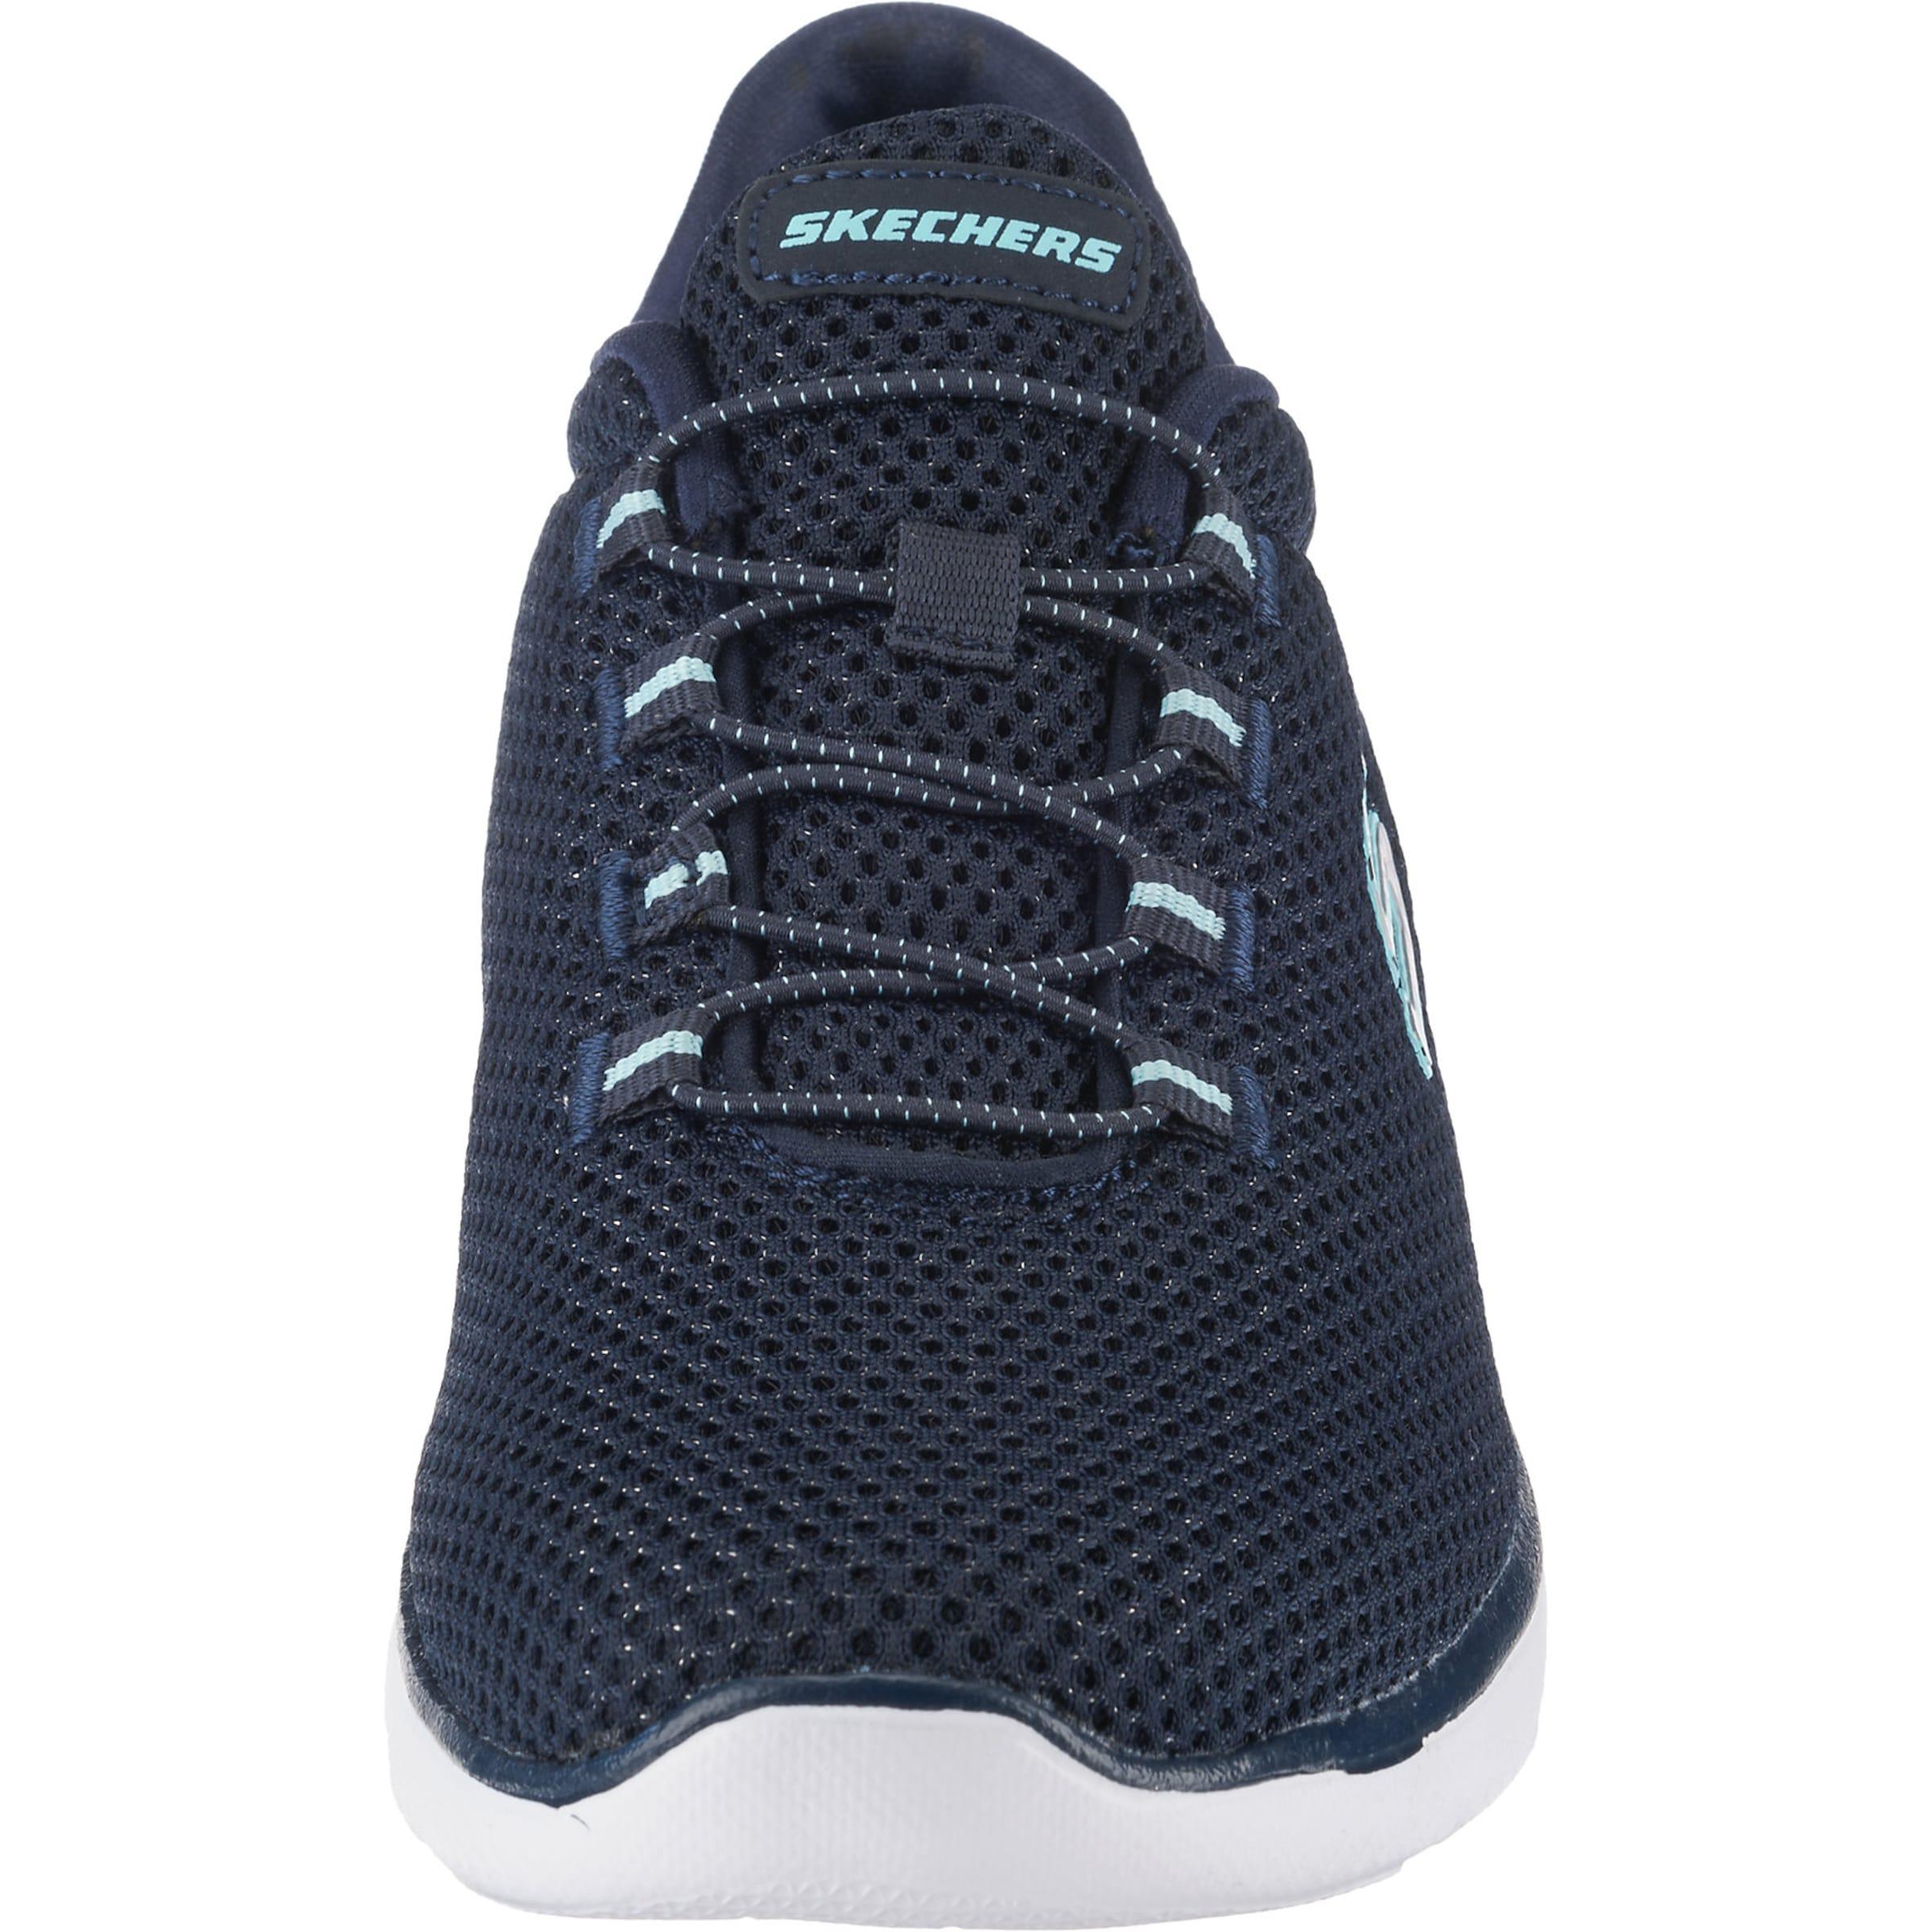 Baskets 'summits' En Marine Skechers Basses Bleu Z8nO0PkXwN